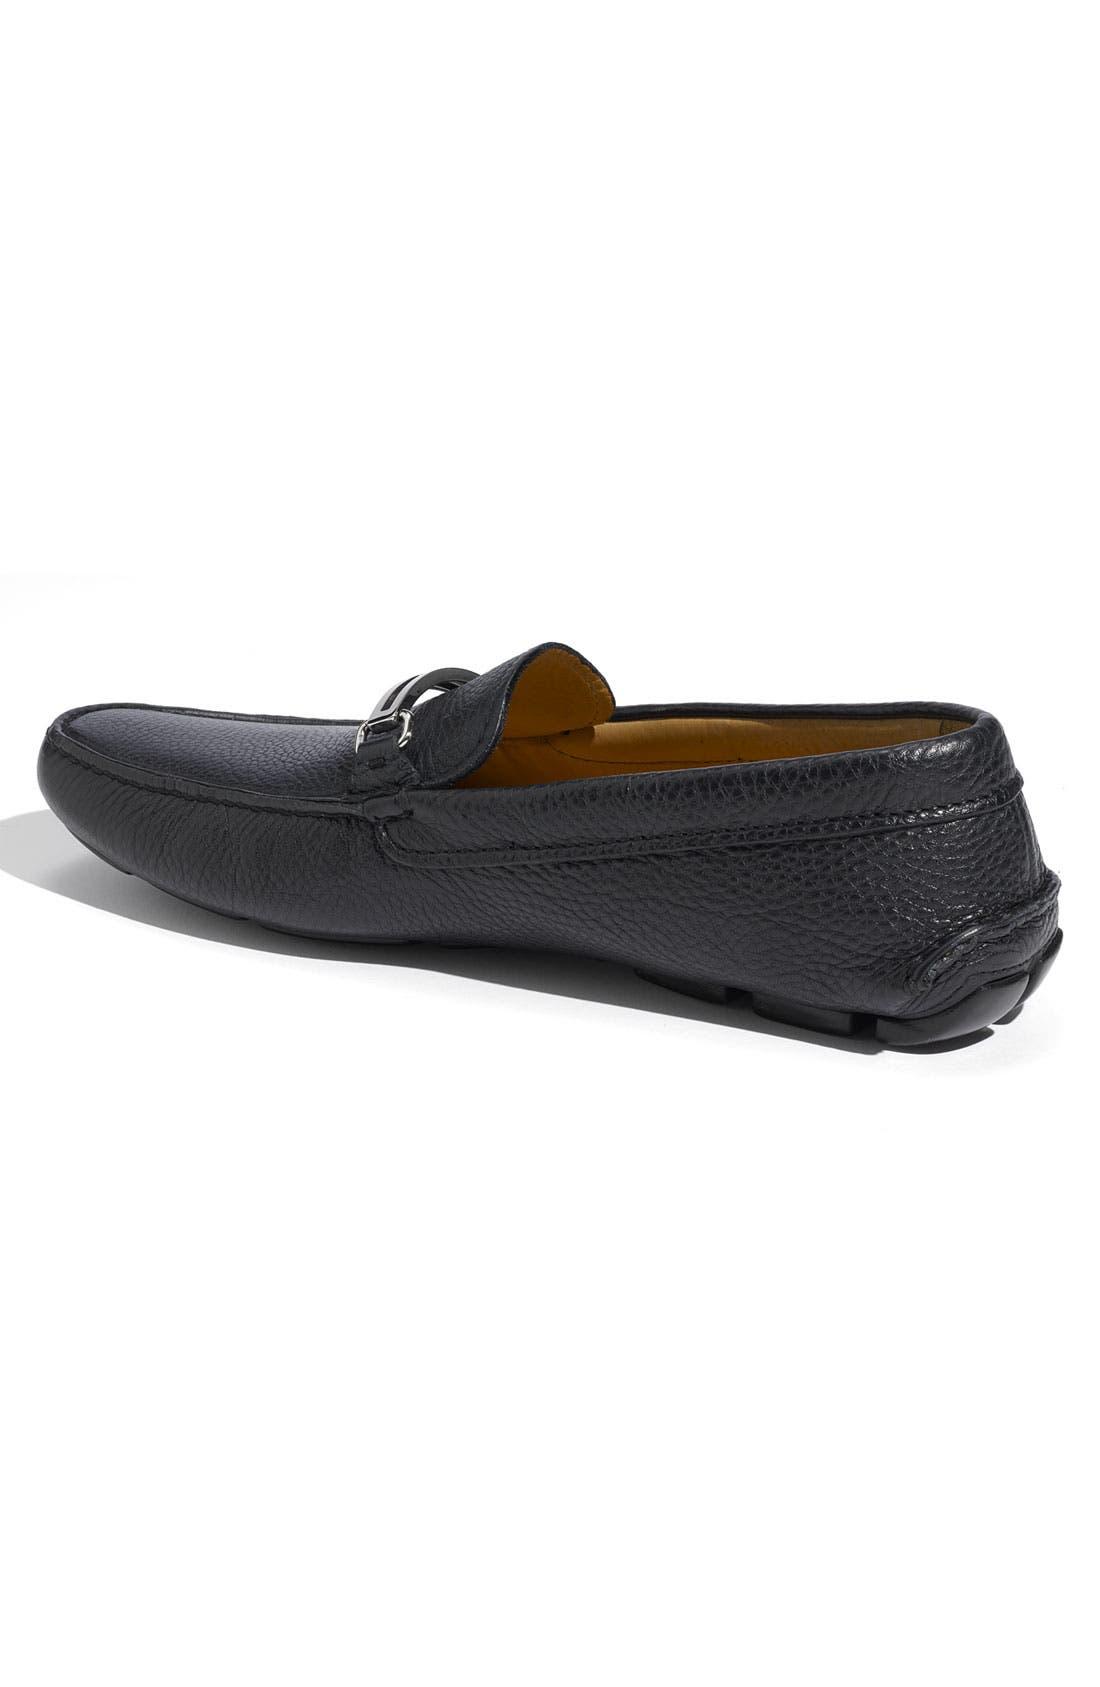 Alternate Image 2  - Prada Driving Shoe (Men) (Nordstrom Exclusive)